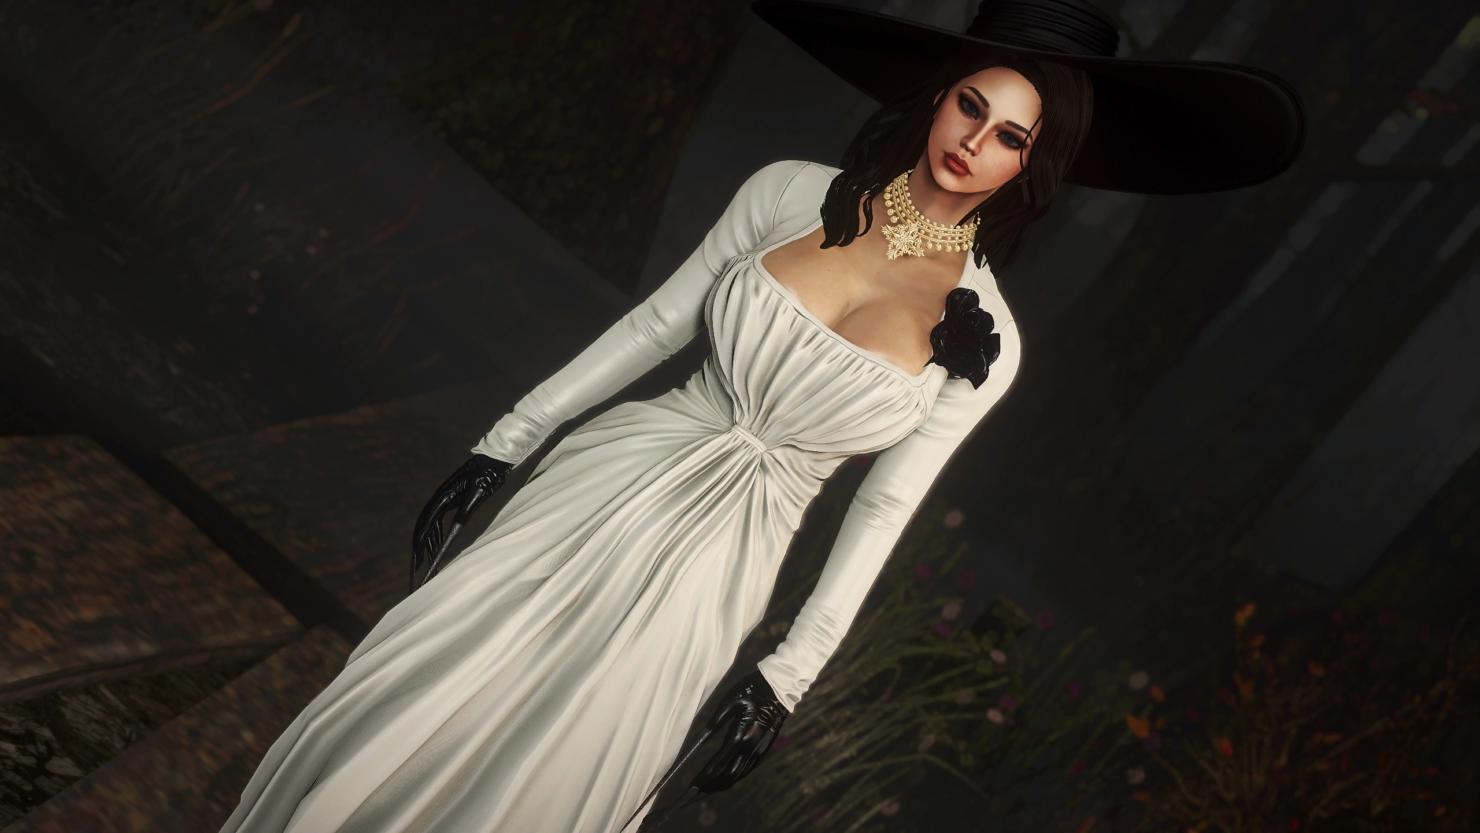 lady-dimitrescu-fallout-4-mod-2